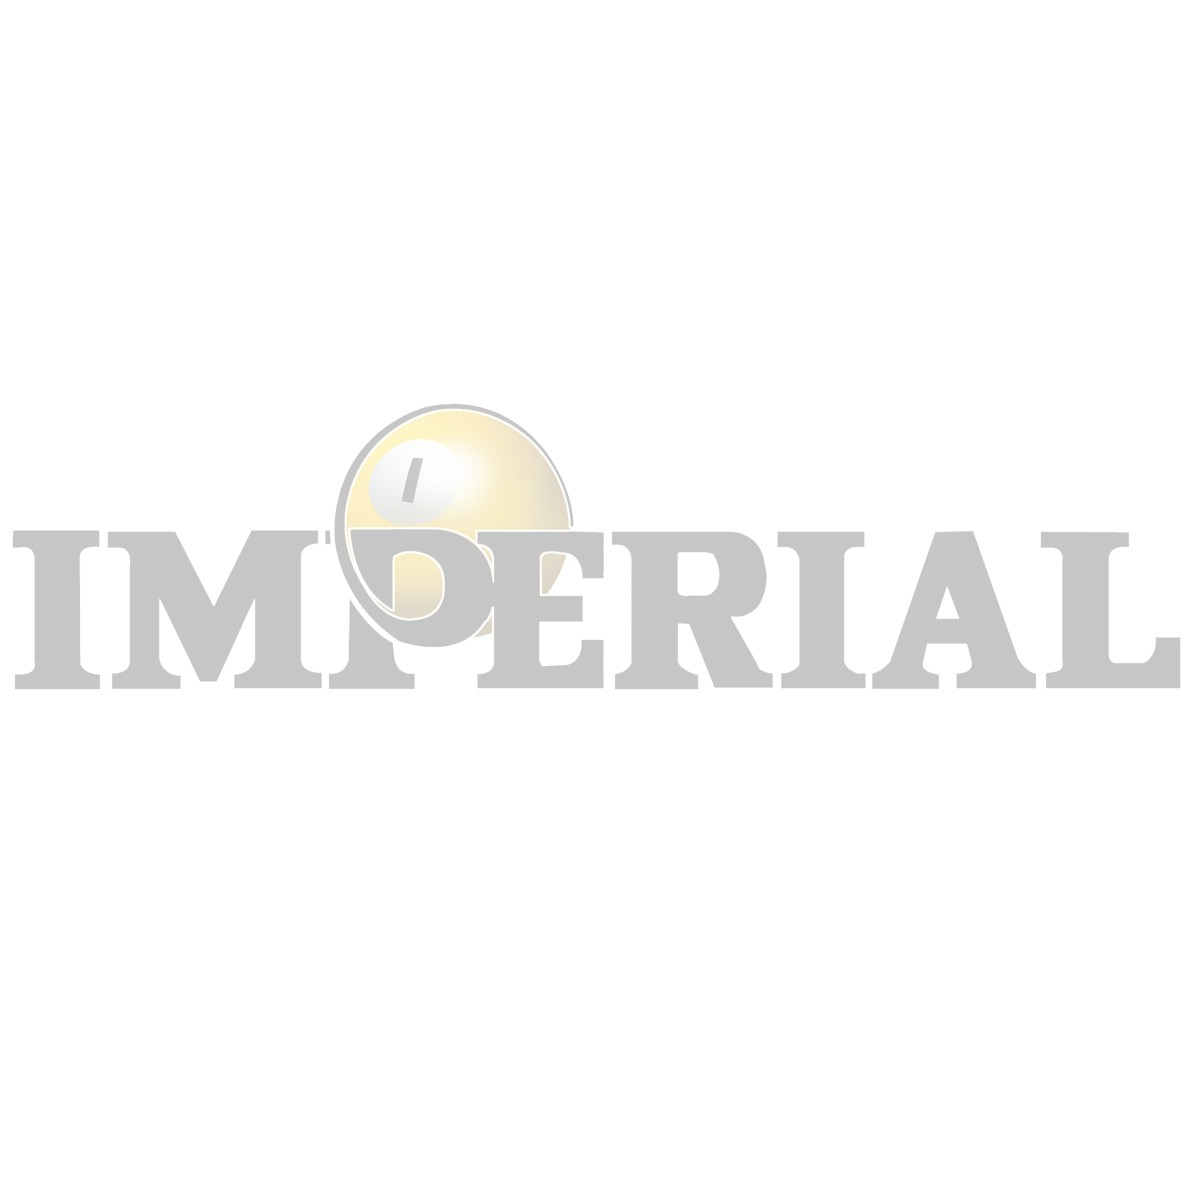 Tampa Bay Buccaneers 9-foot Billiard Cloth